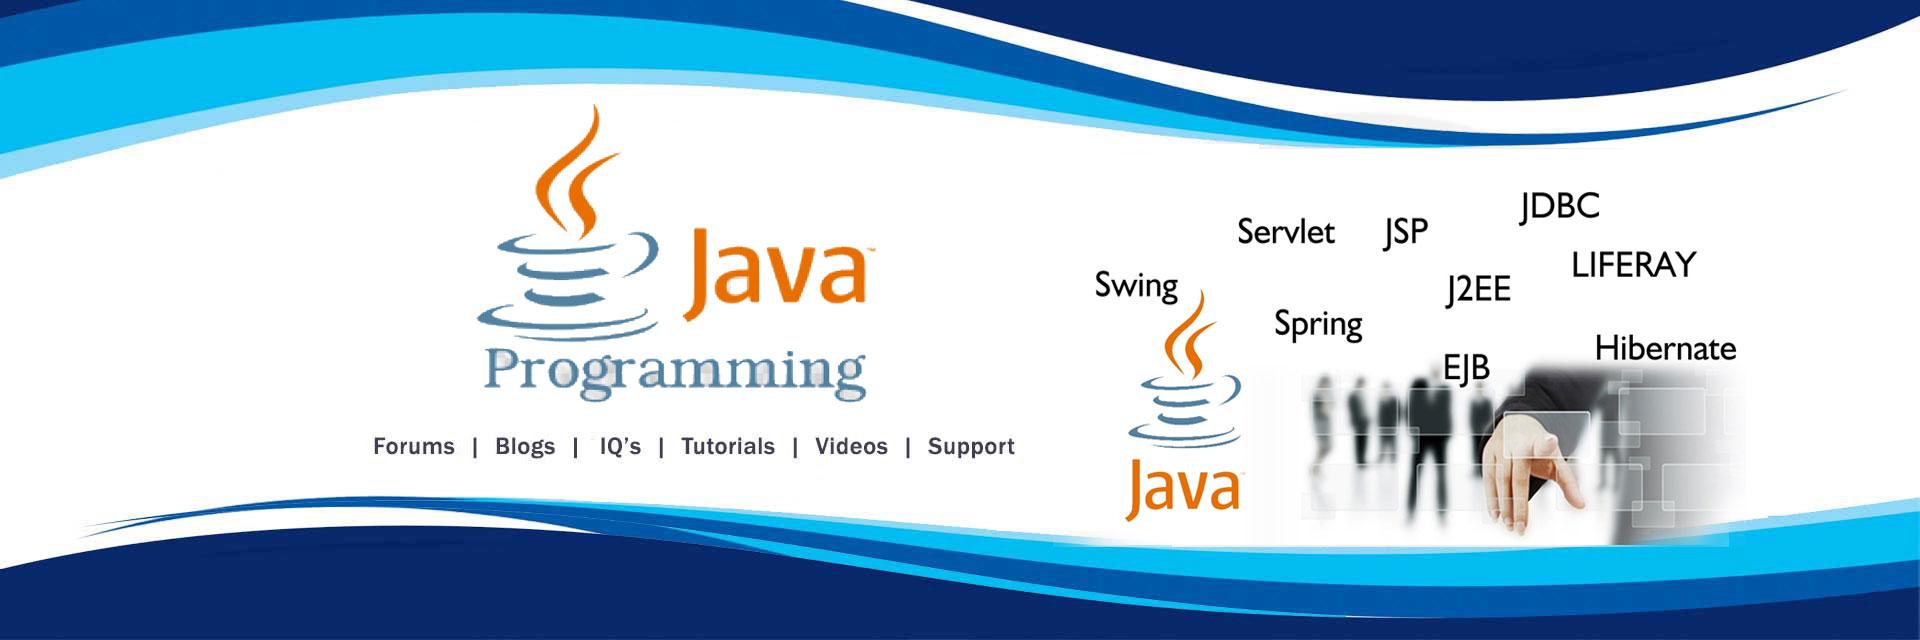 Java - idn kxchange